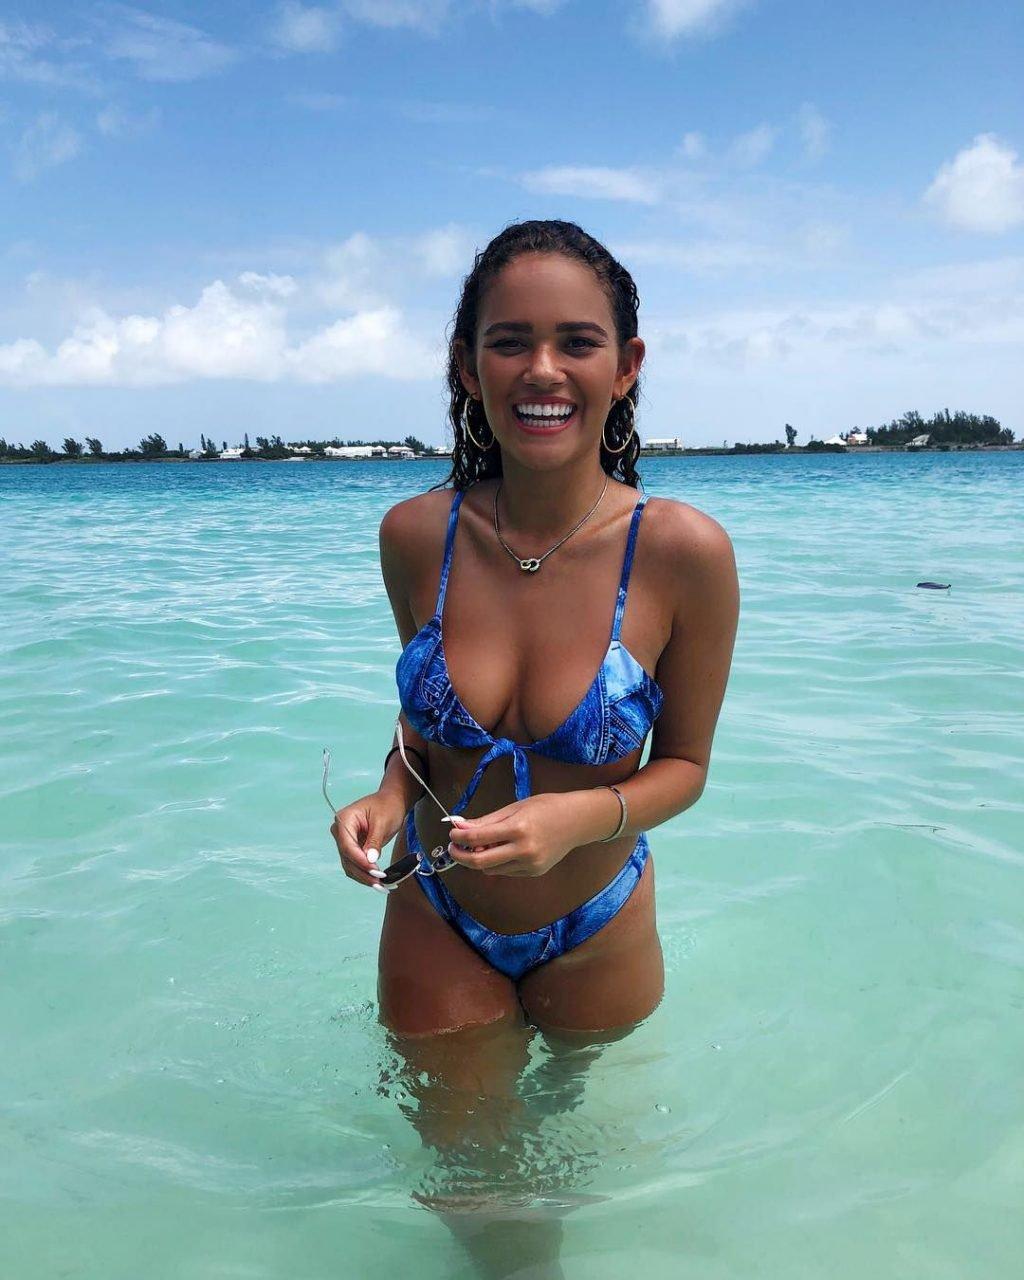 Madison Pettis Sexy (76 Photos)